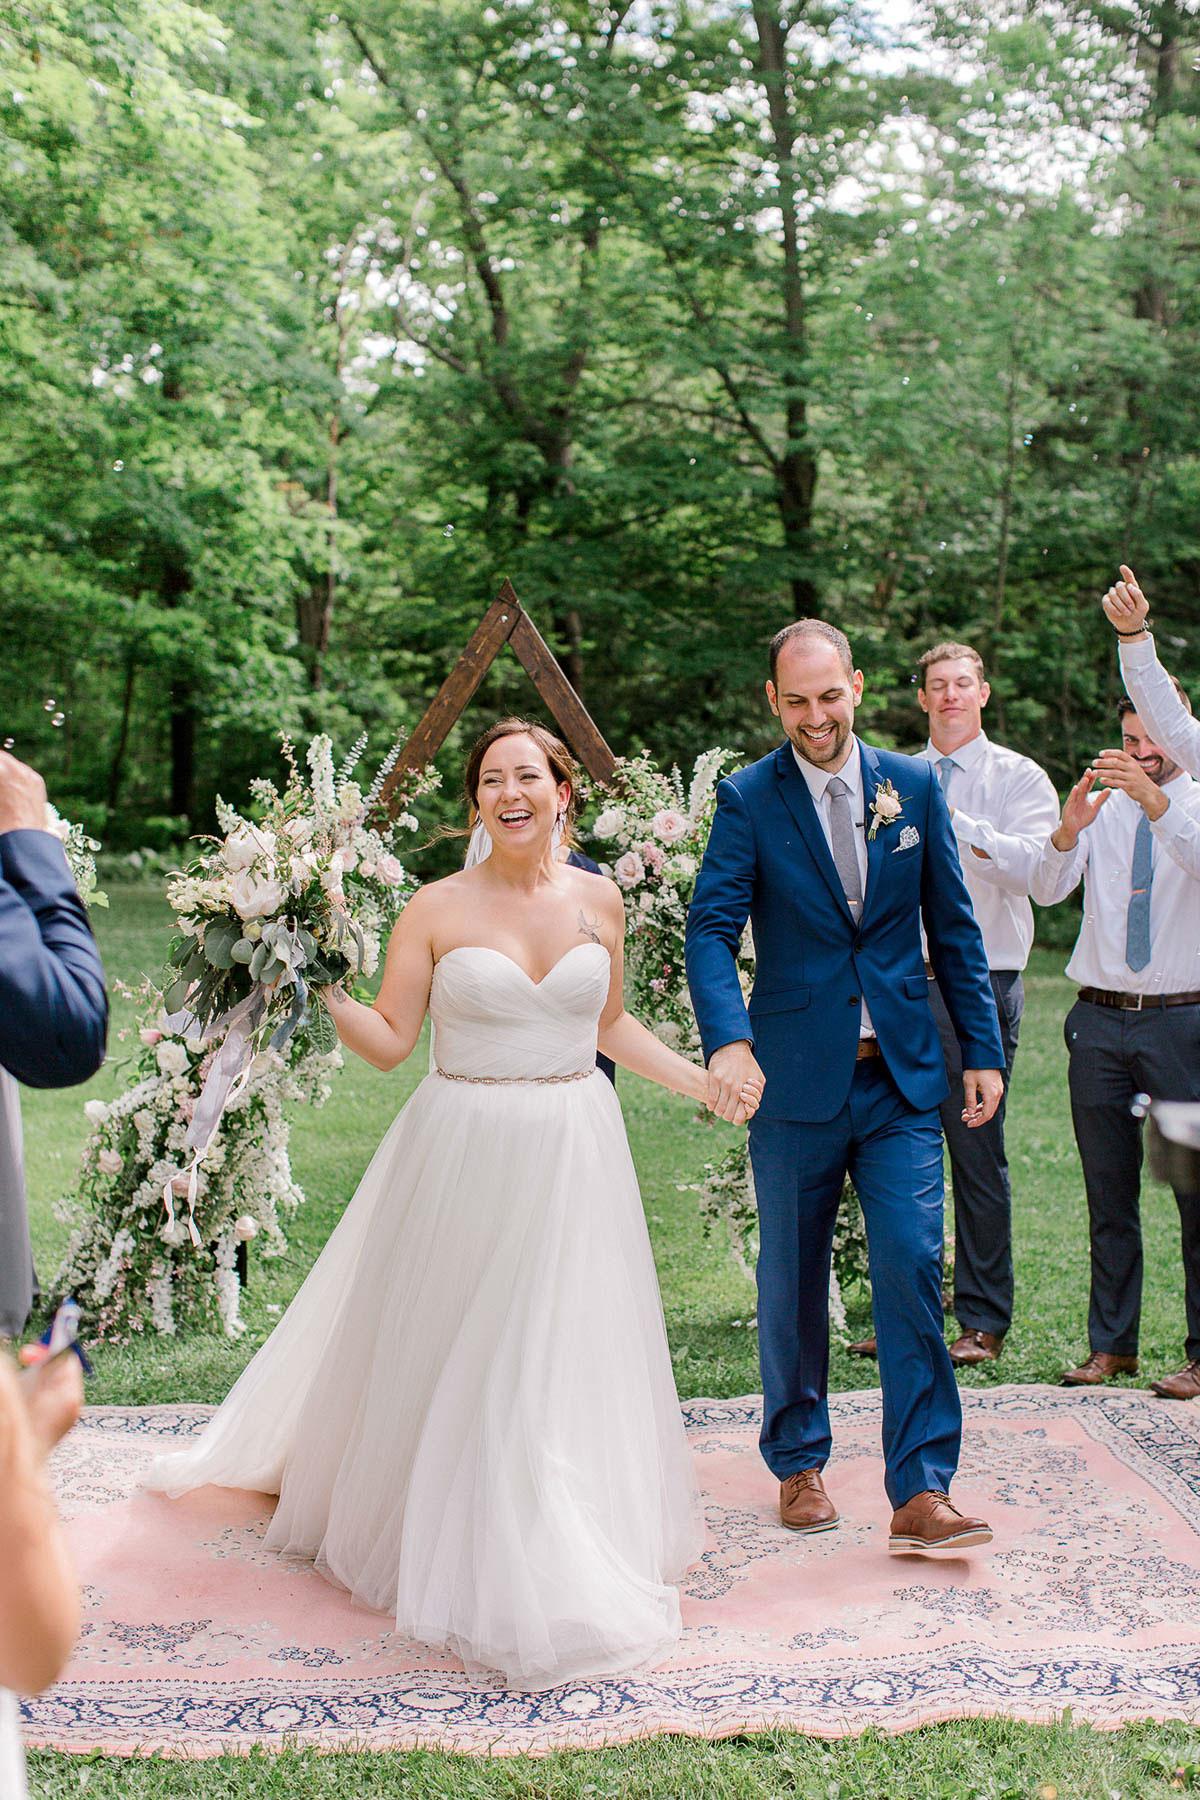 beatrice-elford-photography-vineyard-bride-swish-list-balls-falls-vineland-wedding-51.jpg